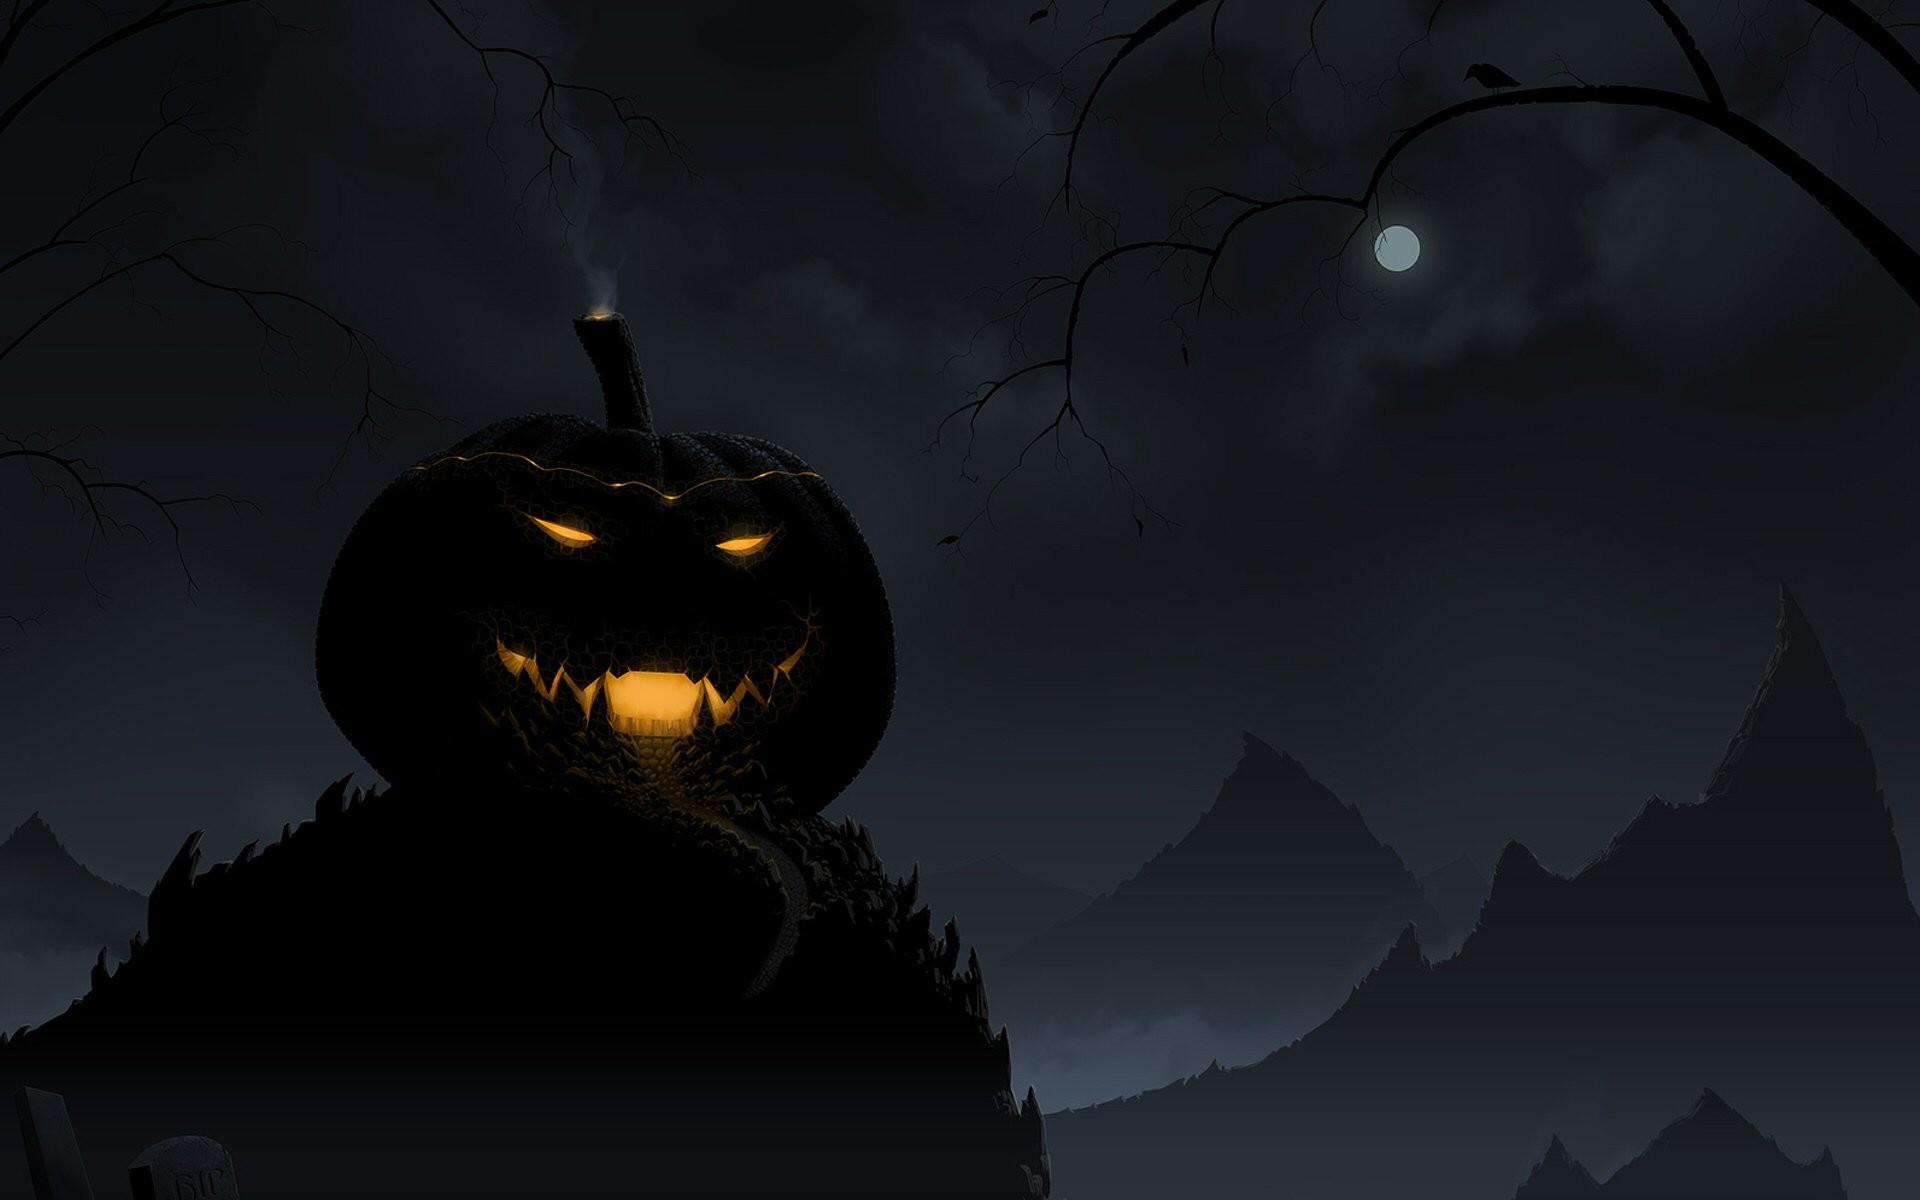 Valentine's Day Wallpaper Graphista Anime Halloween Wallpapers. Spooky  Halloween 435264 – WallDevil. Spooky Halloween 435264 WallDevil